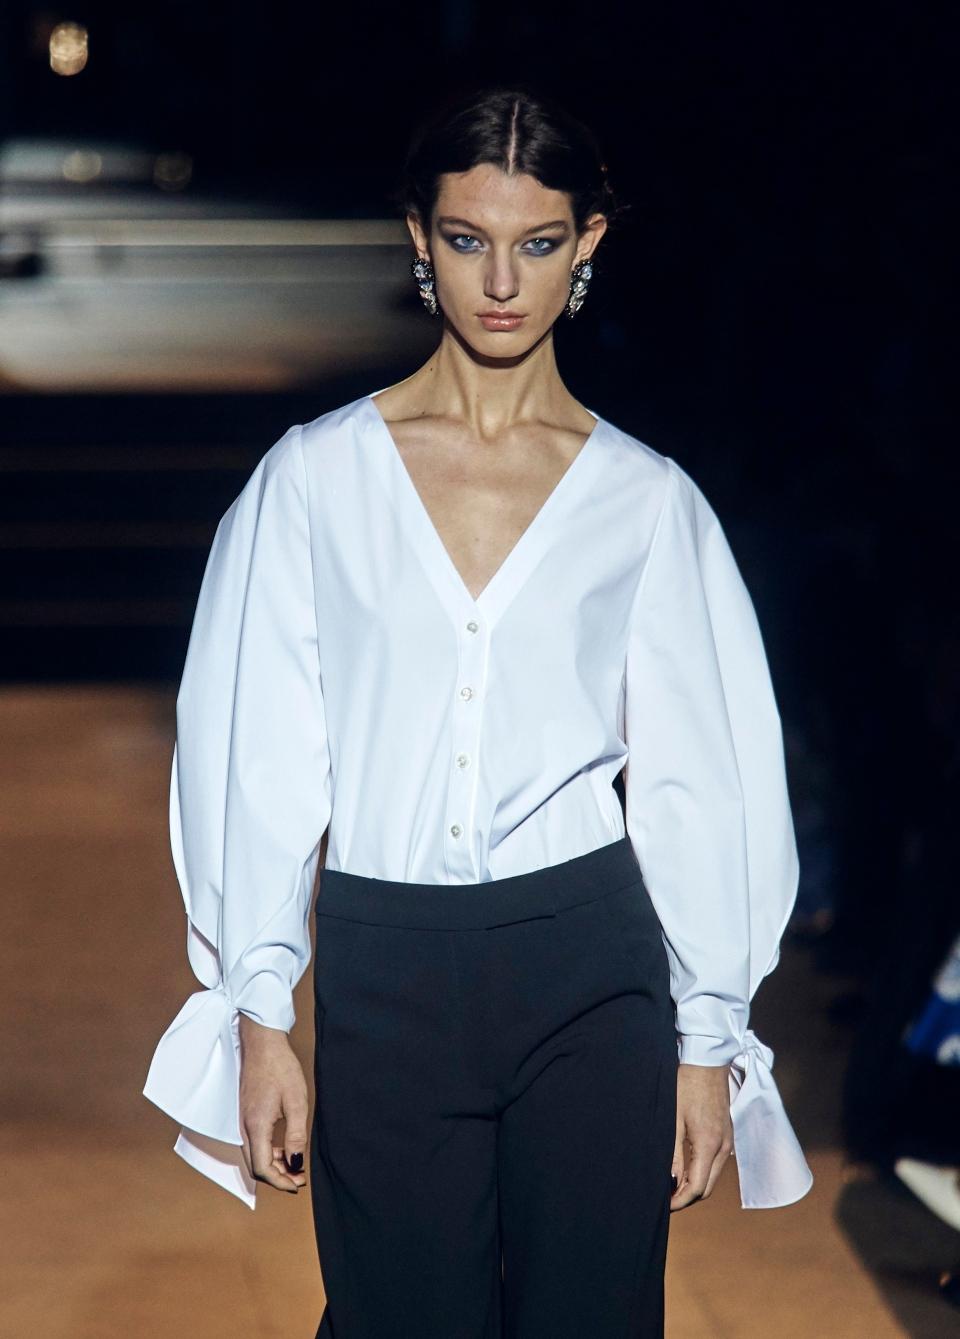 Fashion from Carolina Herrera collection is modeled during Fashion Week in New York, Monday, Feb. 12, 2018. (AP Photo/Andres Kudacki)